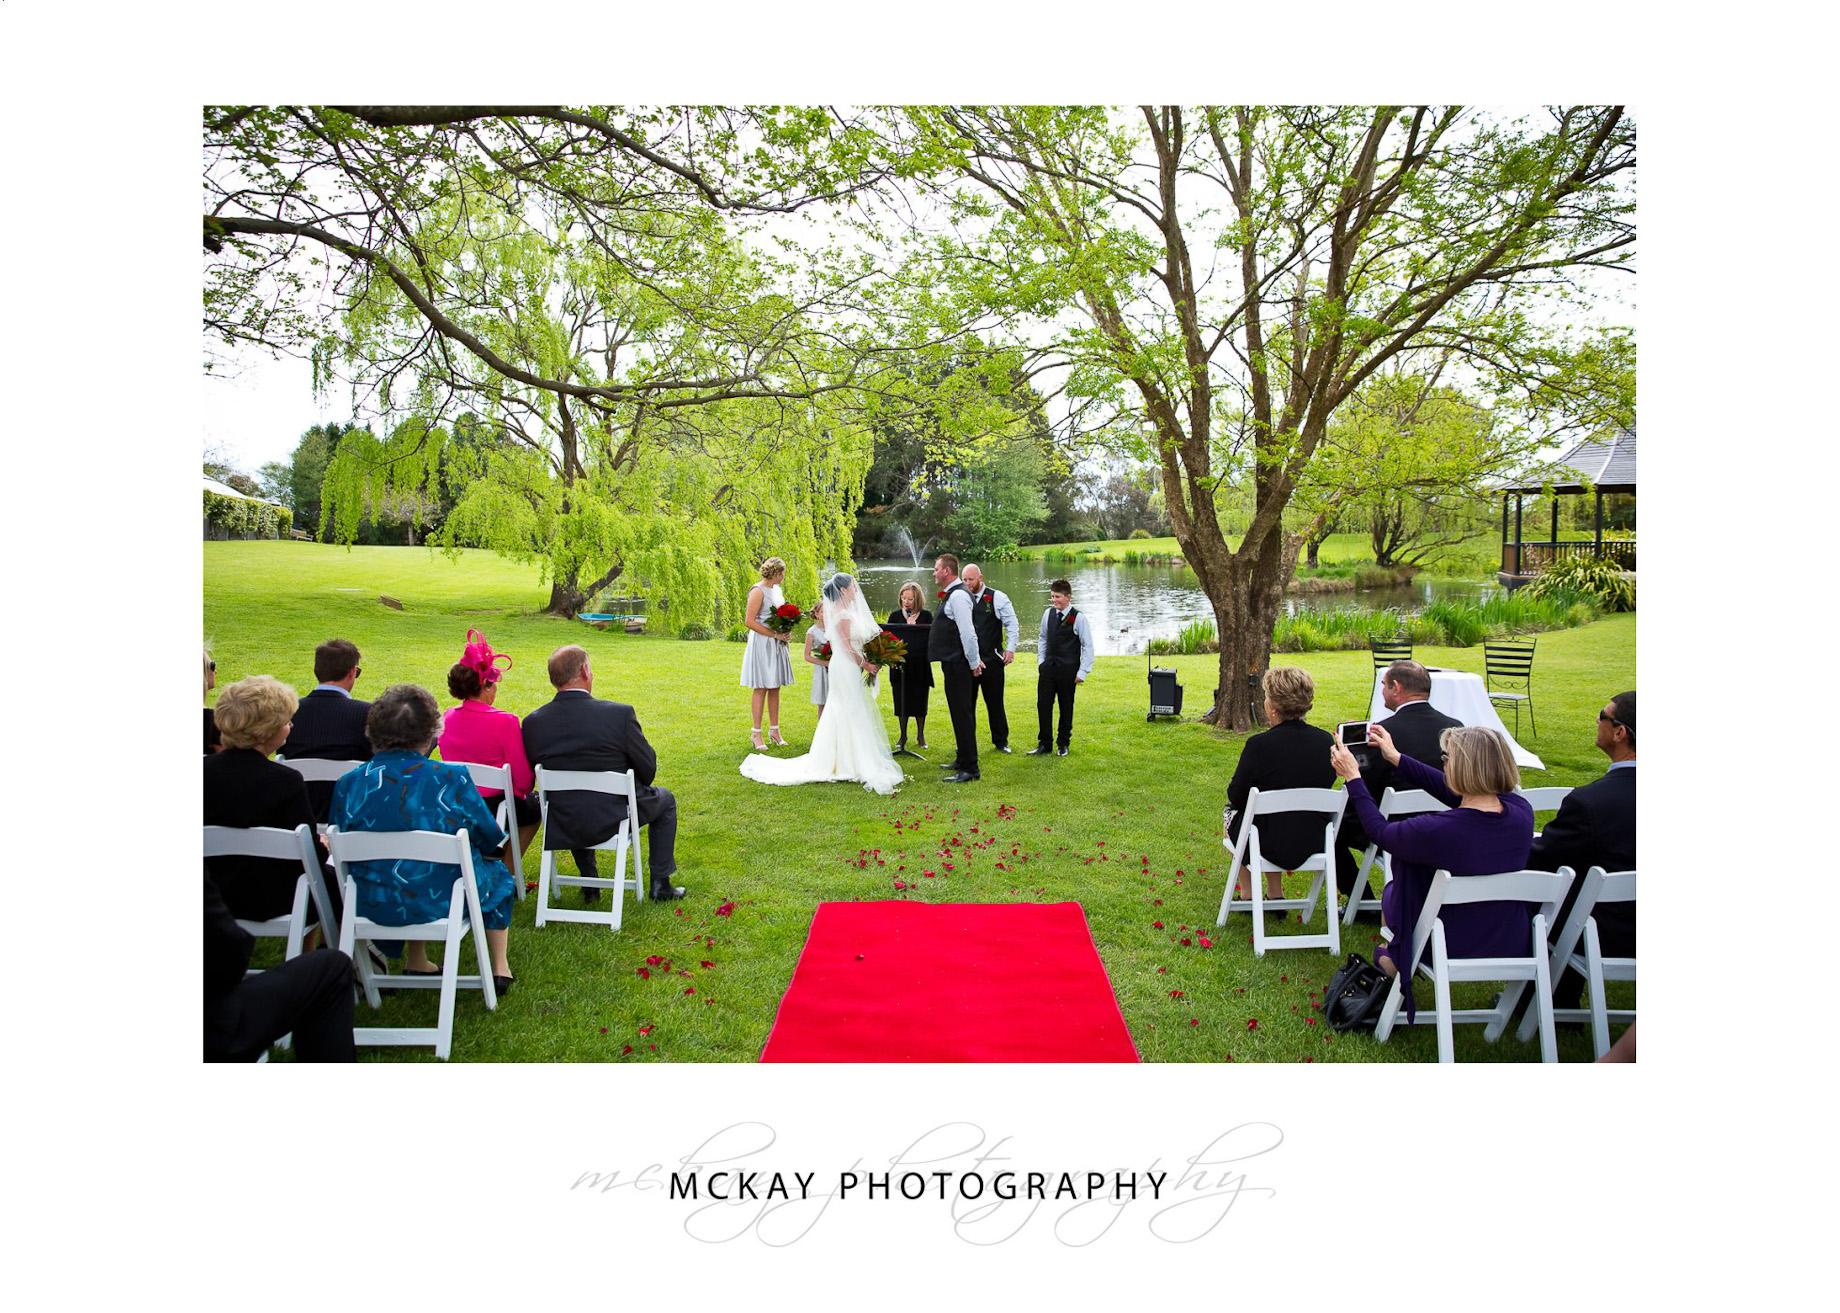 Wedding ceremony at Briars near lake